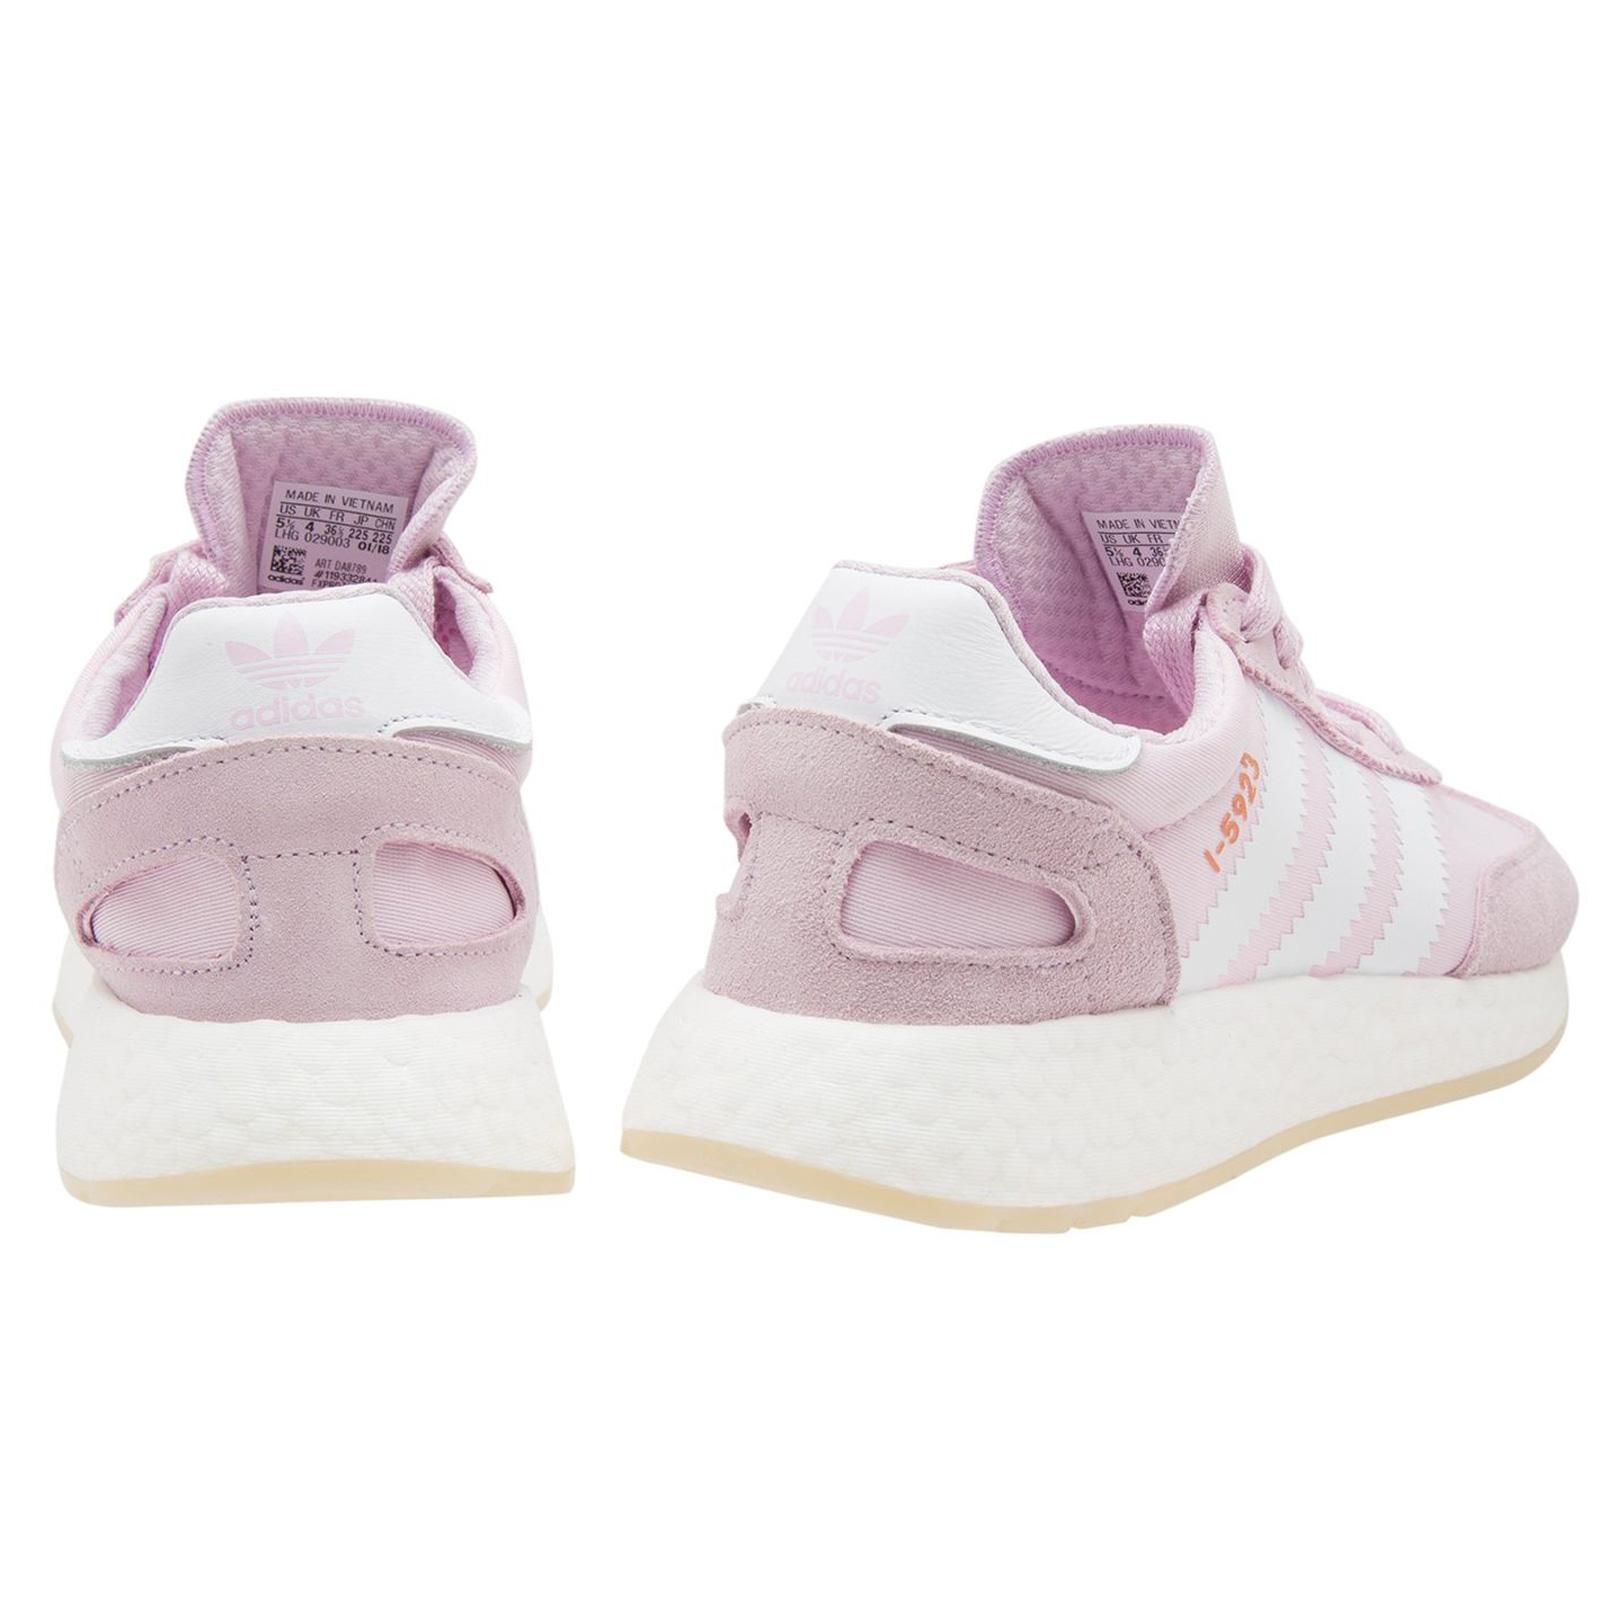 adidas Iniki Runner I 5923 Damen Sneaker Turnschuhe Schuhe Aero Pink Rosa DA8789